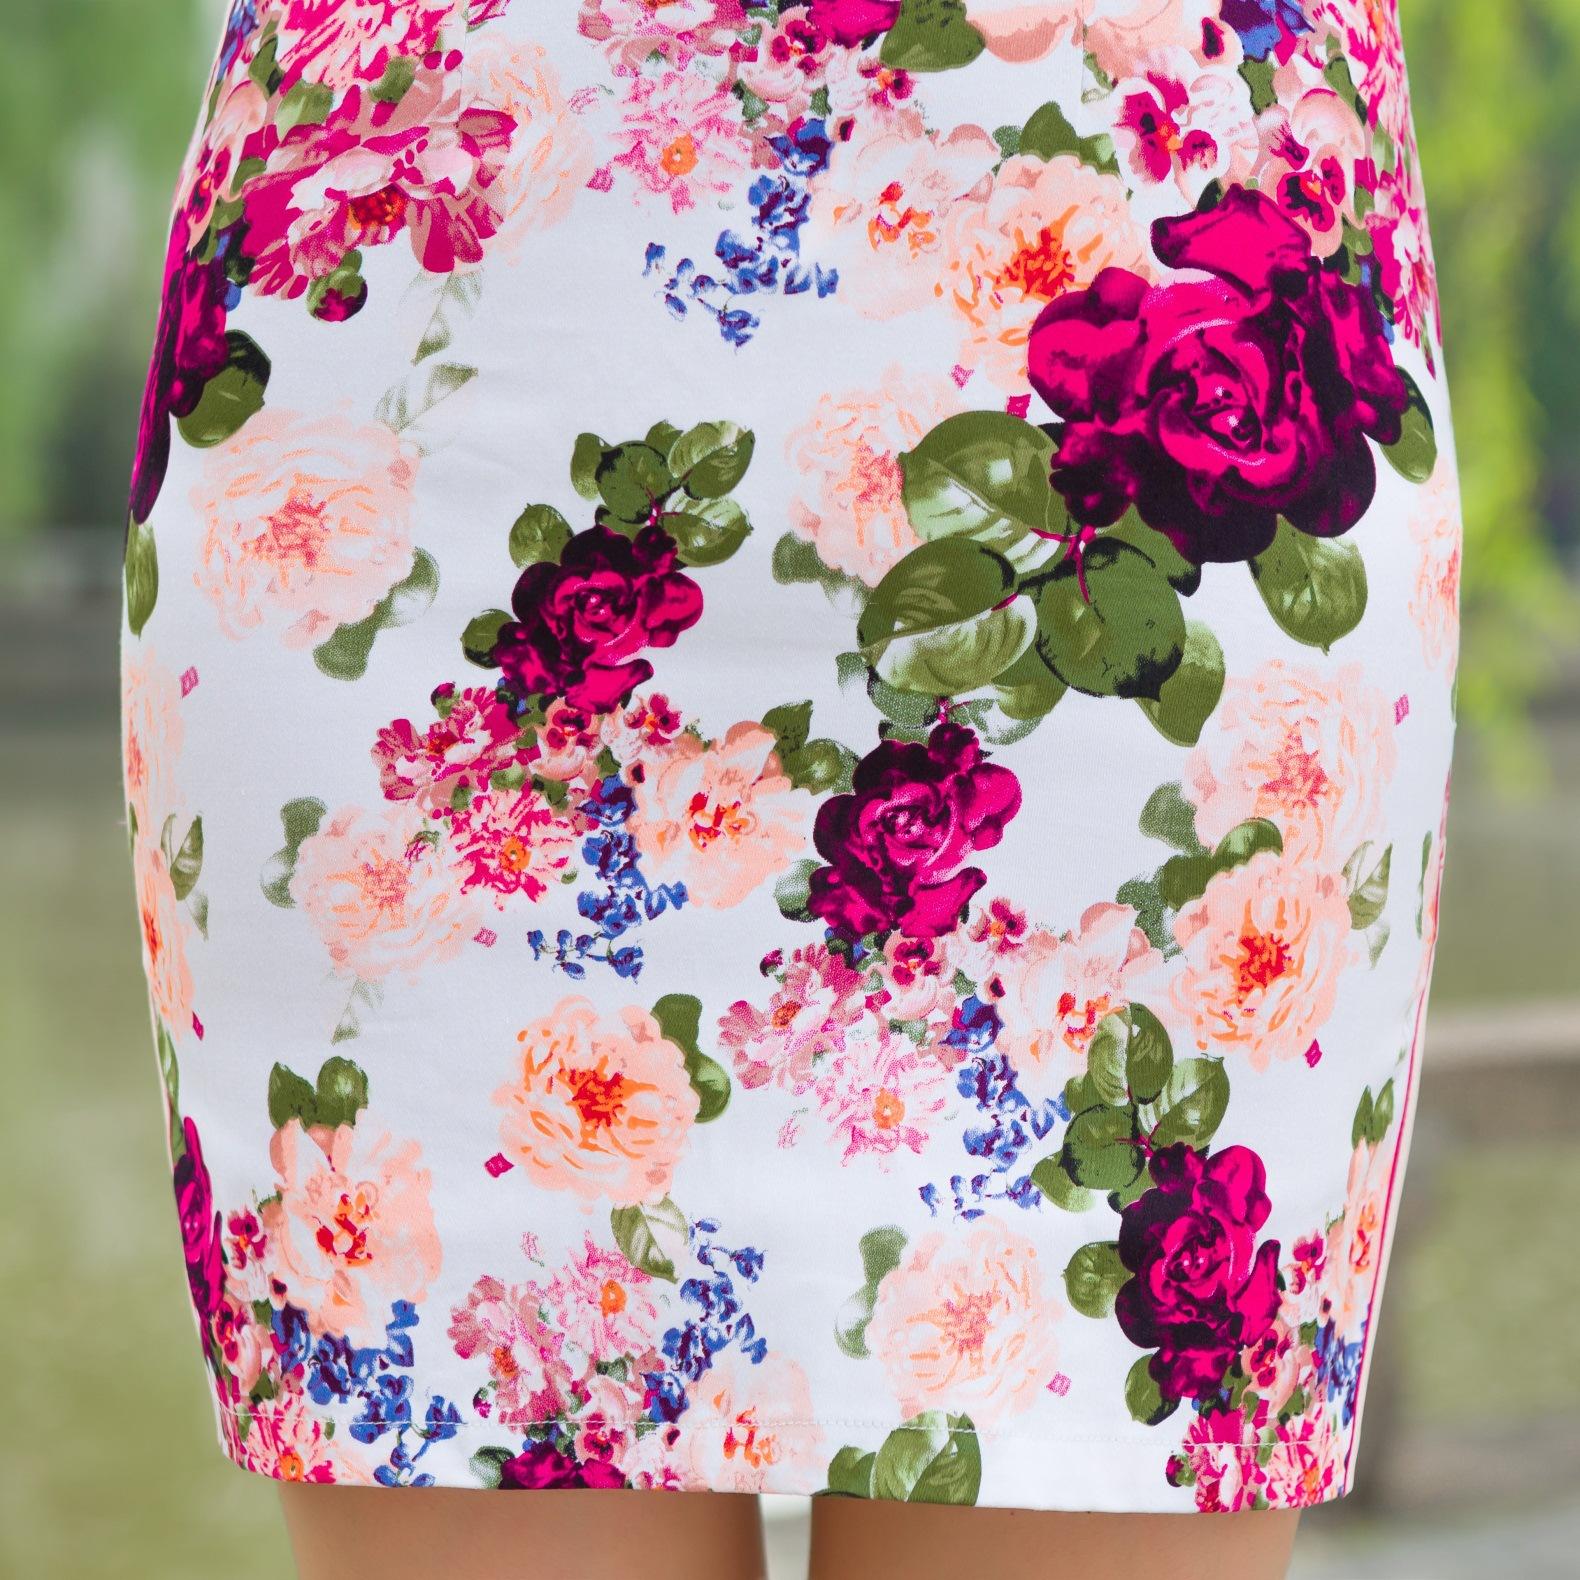 Fashion Woman Cheongsam Summer Short Sleeve Qipao Traditional Chinese Clothing